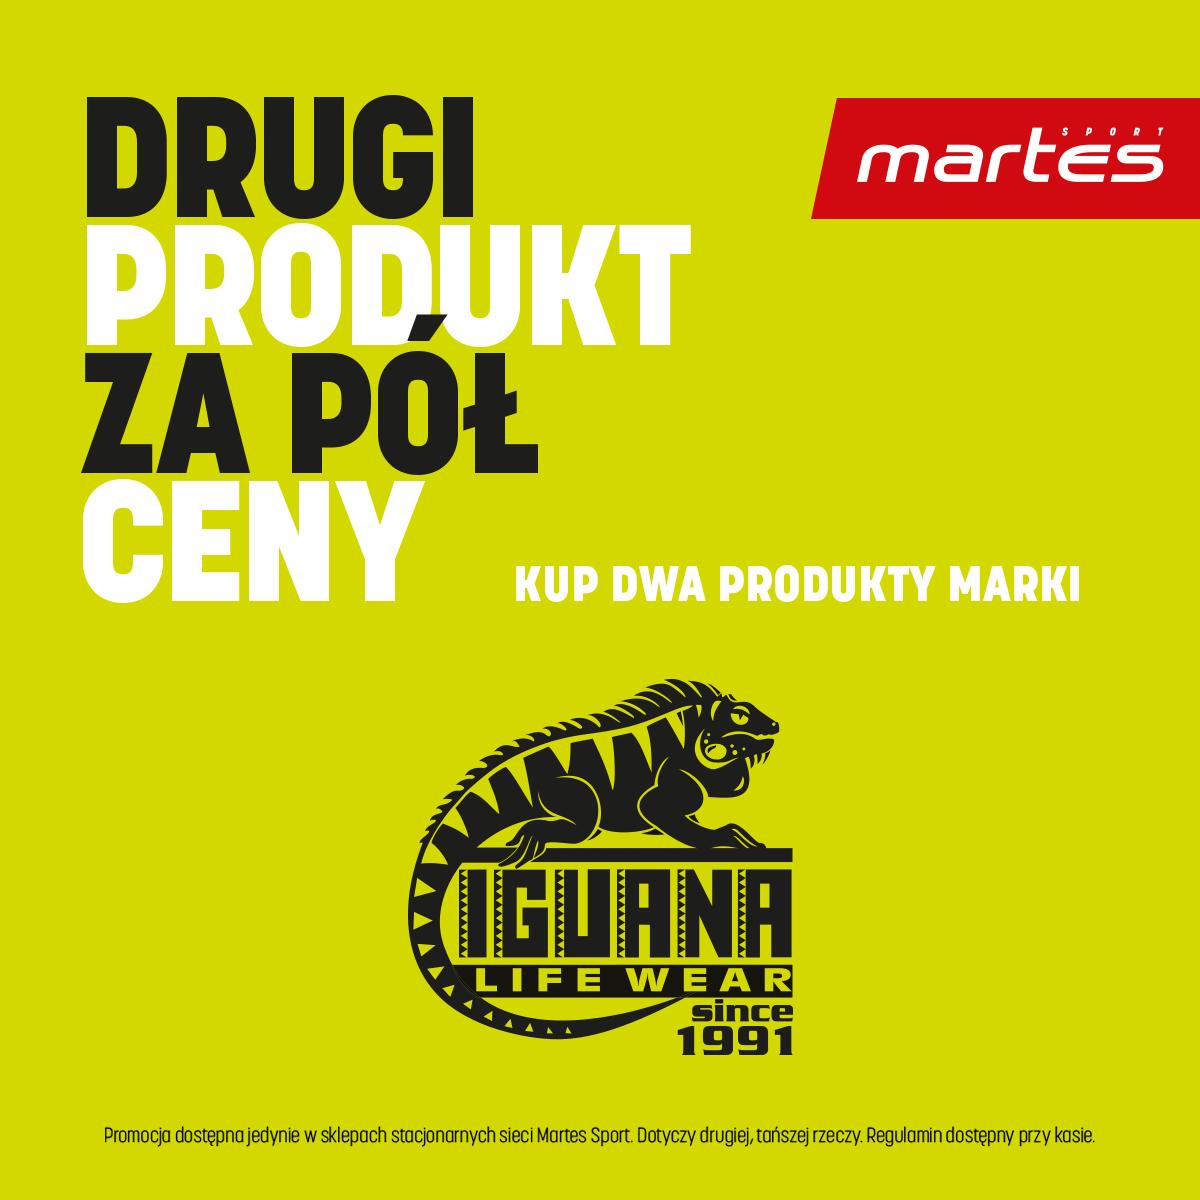 Promocje -50% na drugi produkt w Martes Sport